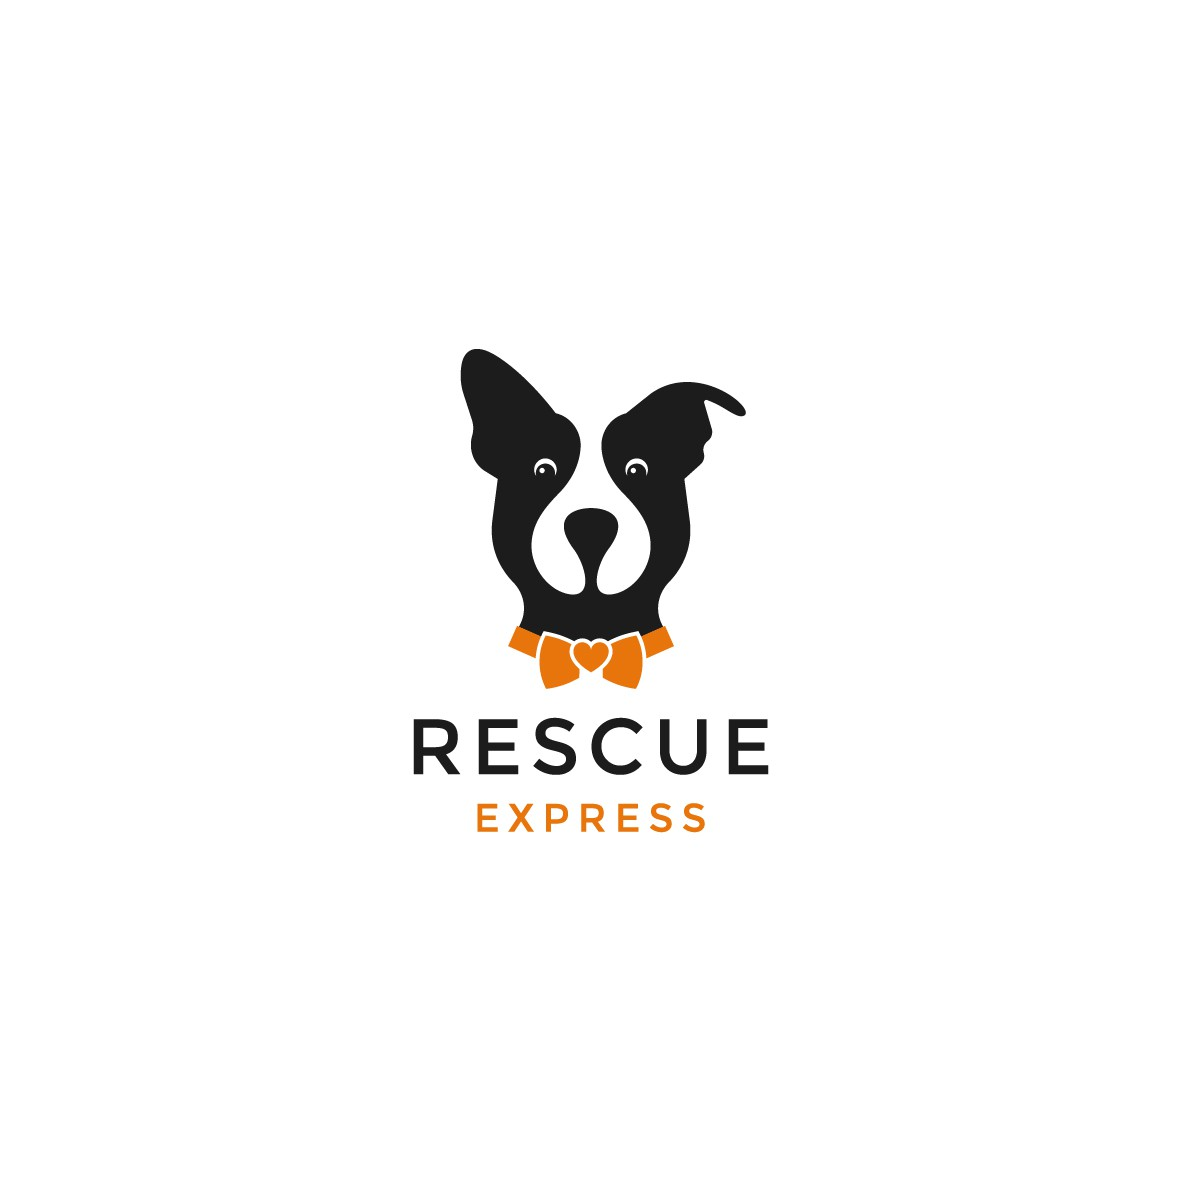 need striking, eye catching branding logo for non profit dog rescue